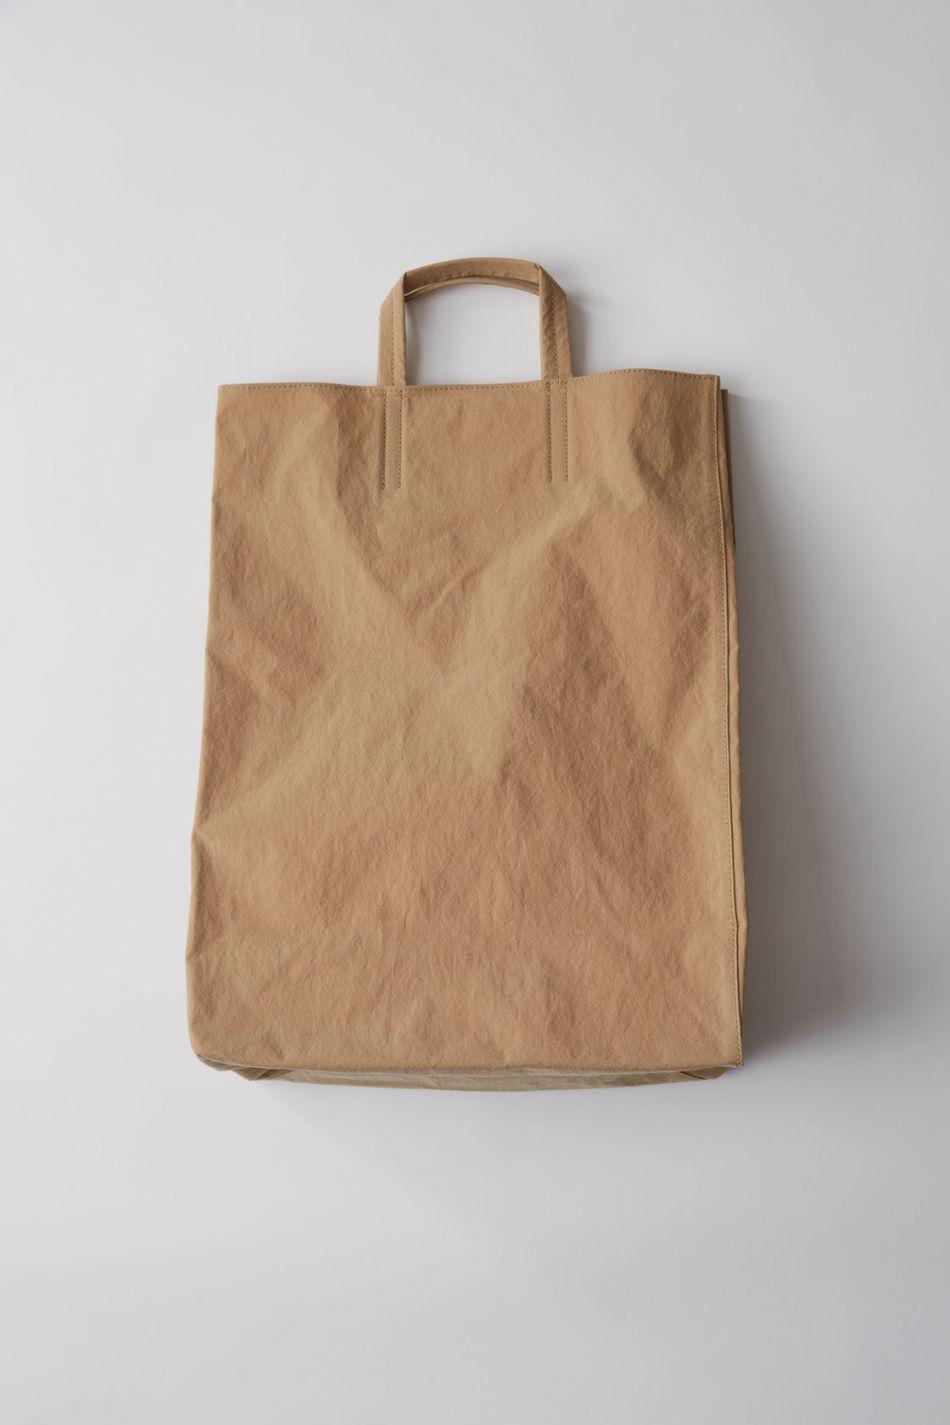 Acne propose sa version du sac en papier.